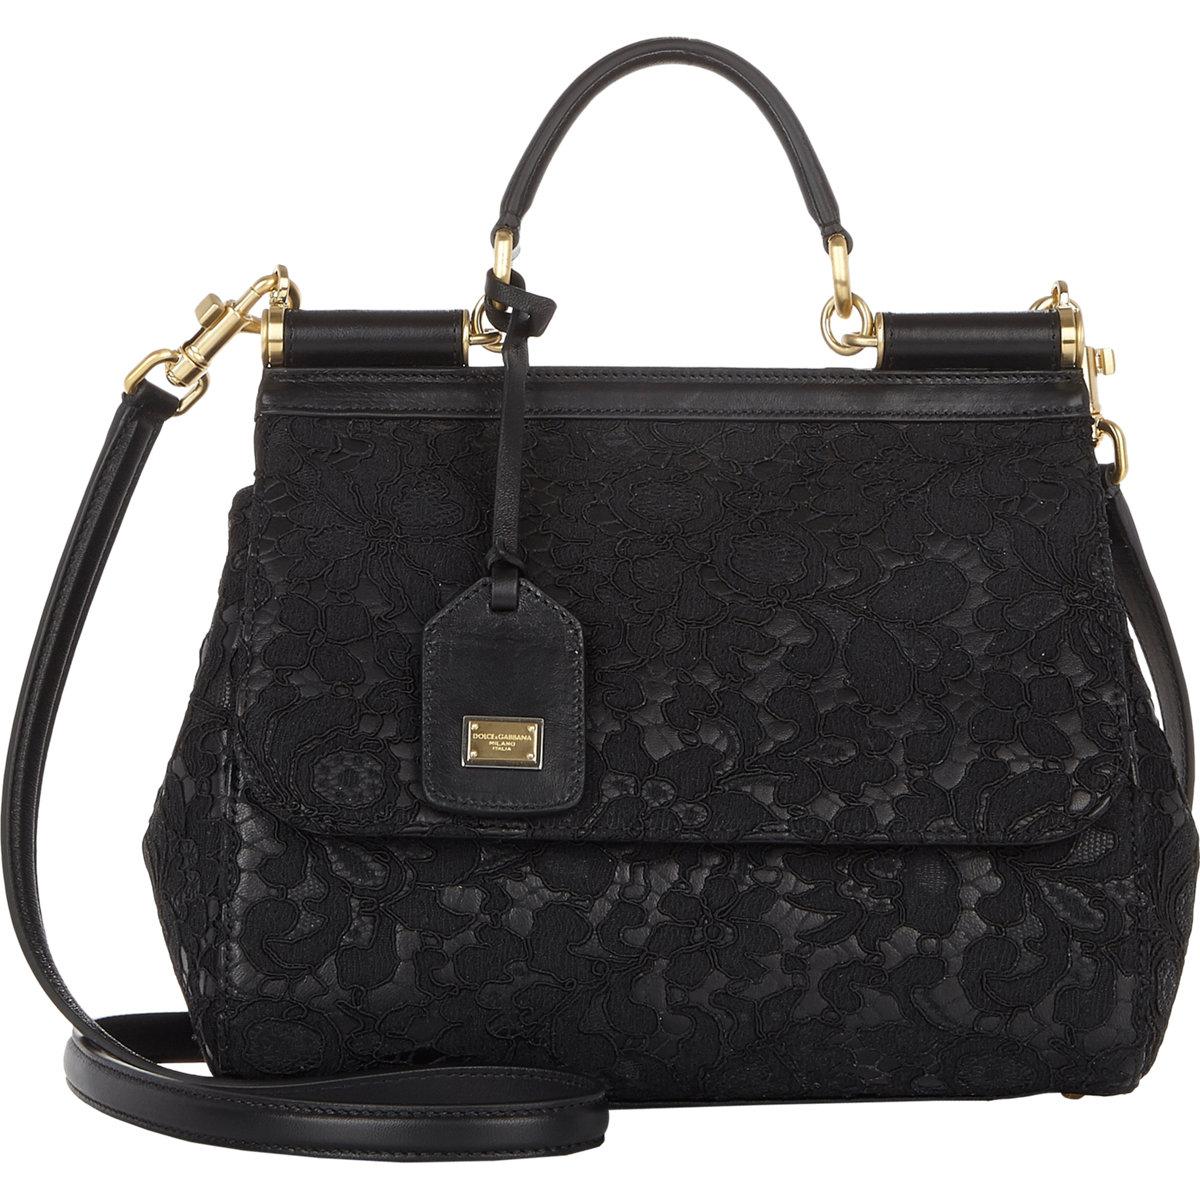 Dolce & gabbana Lace Medium Miss Sicily Bag in Black